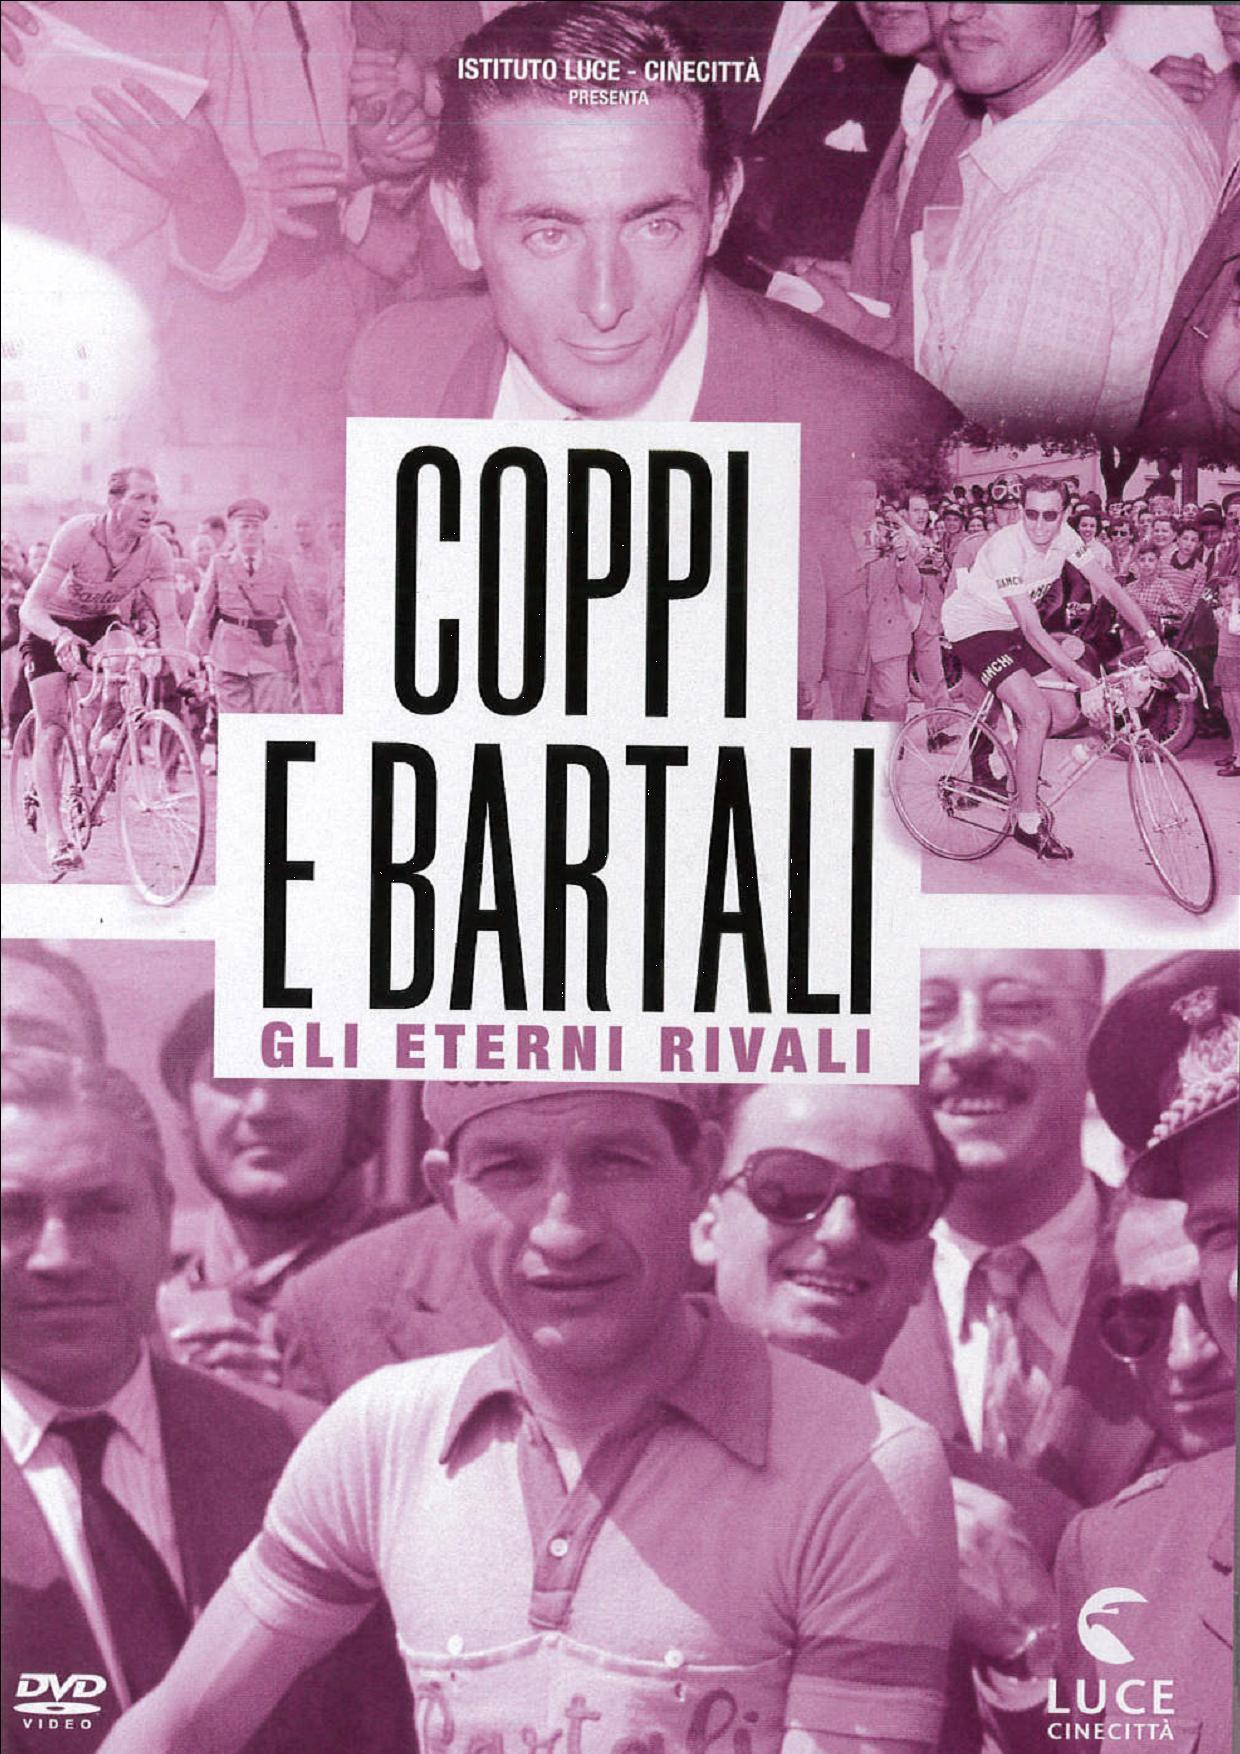 COPPI E BARTALI GLI ETERNI RIVALI (DVD)